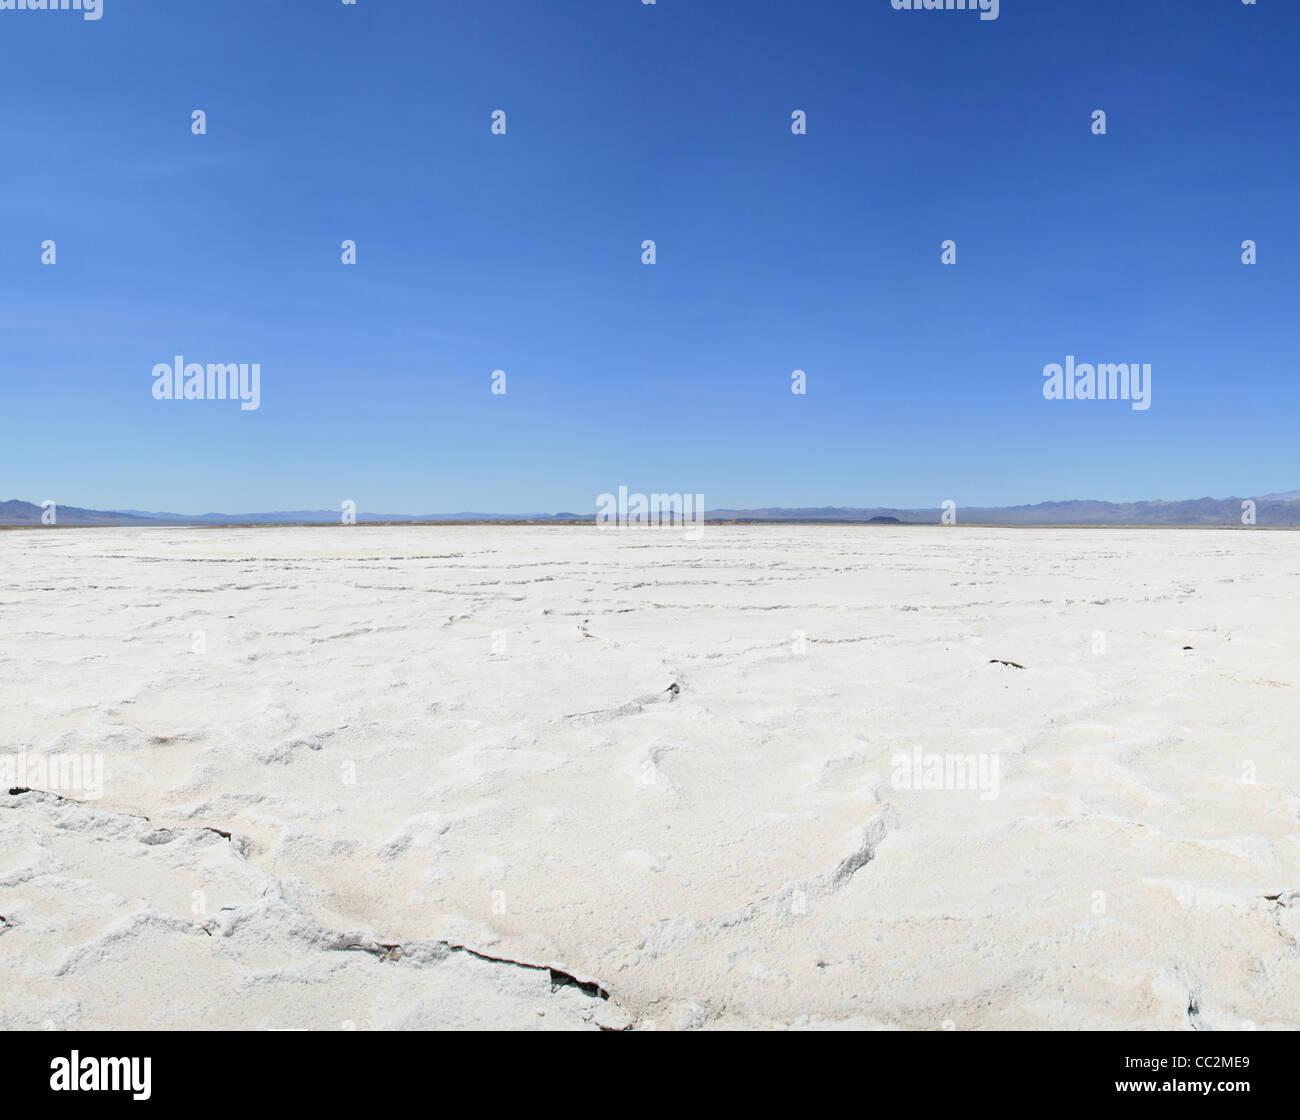 Bristol dry lake salt pan in the Mojave Desert of California with blue sky - Stock Image